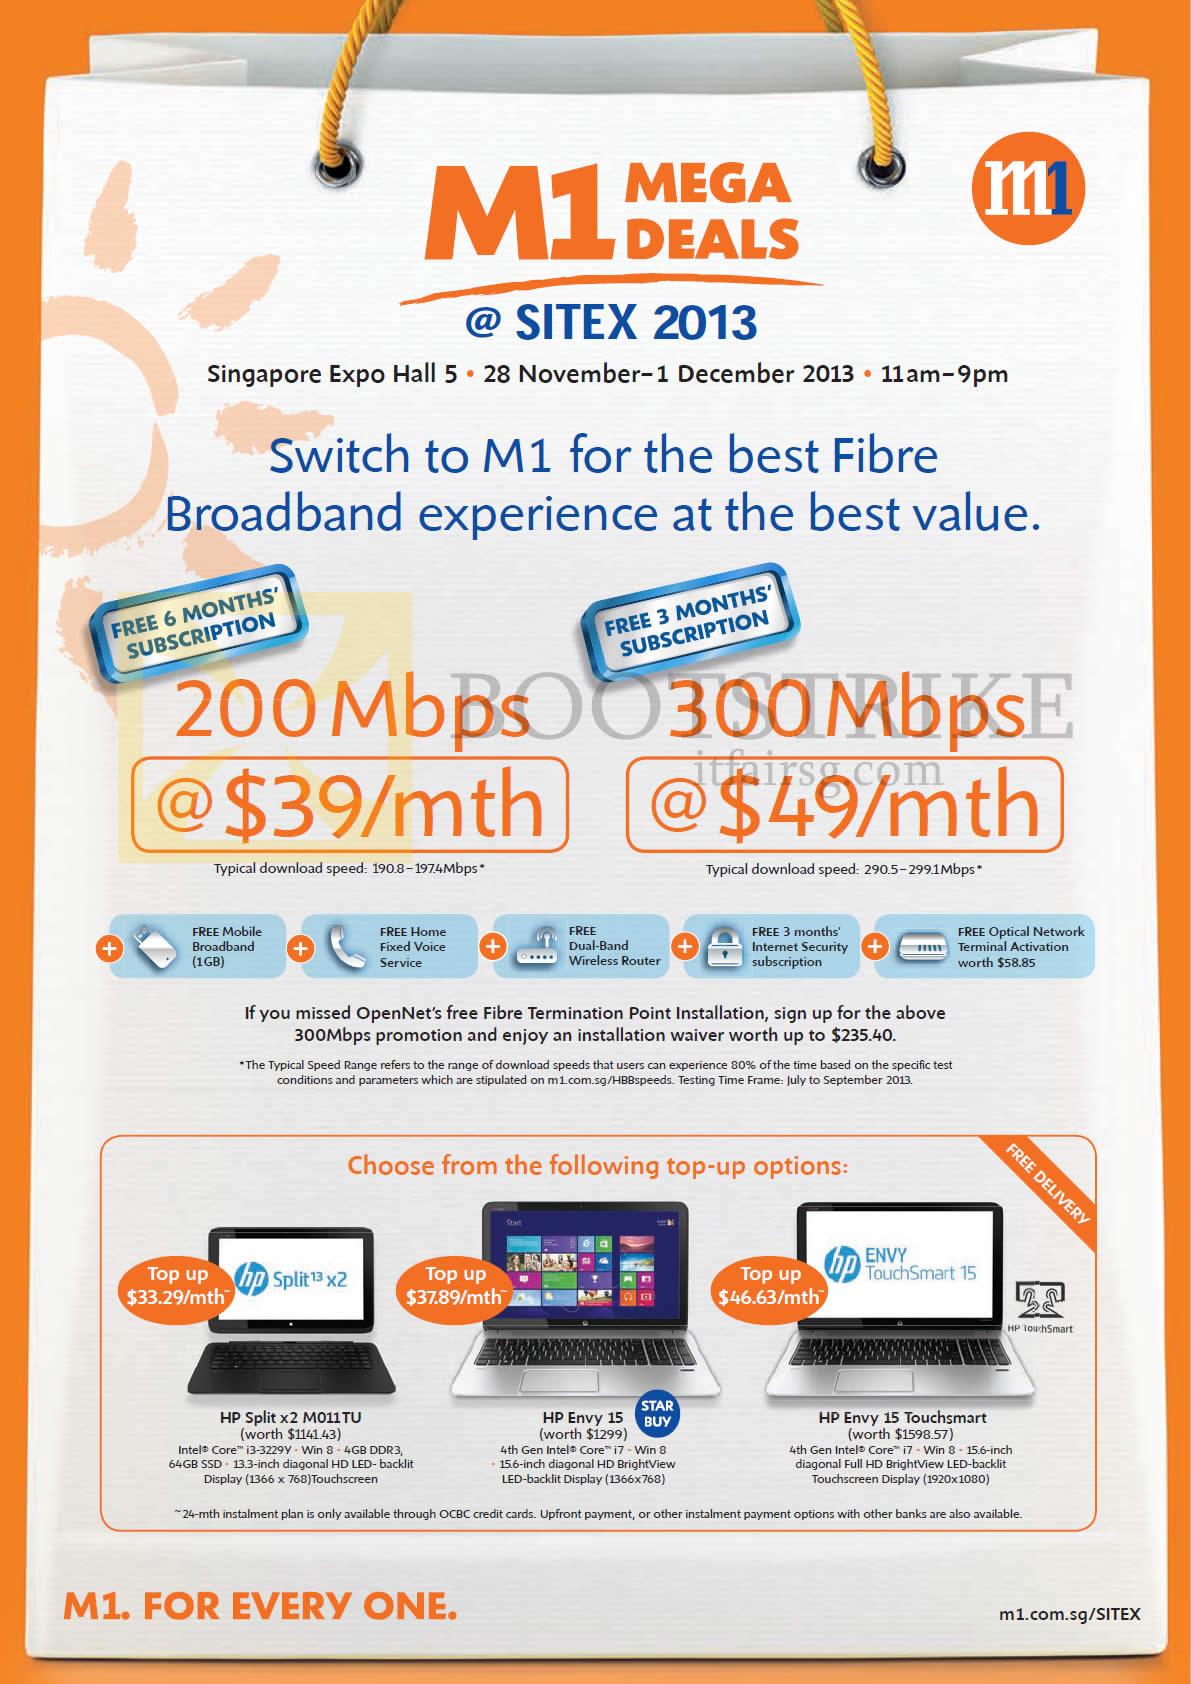 Fibre Broadband 200mbps 39.00 Free 6 Months, 300Mbps 49.00 Free 3 Months, HP Split x2 M011TU Notebook, Envy 15, Envy 15 Touchsmart